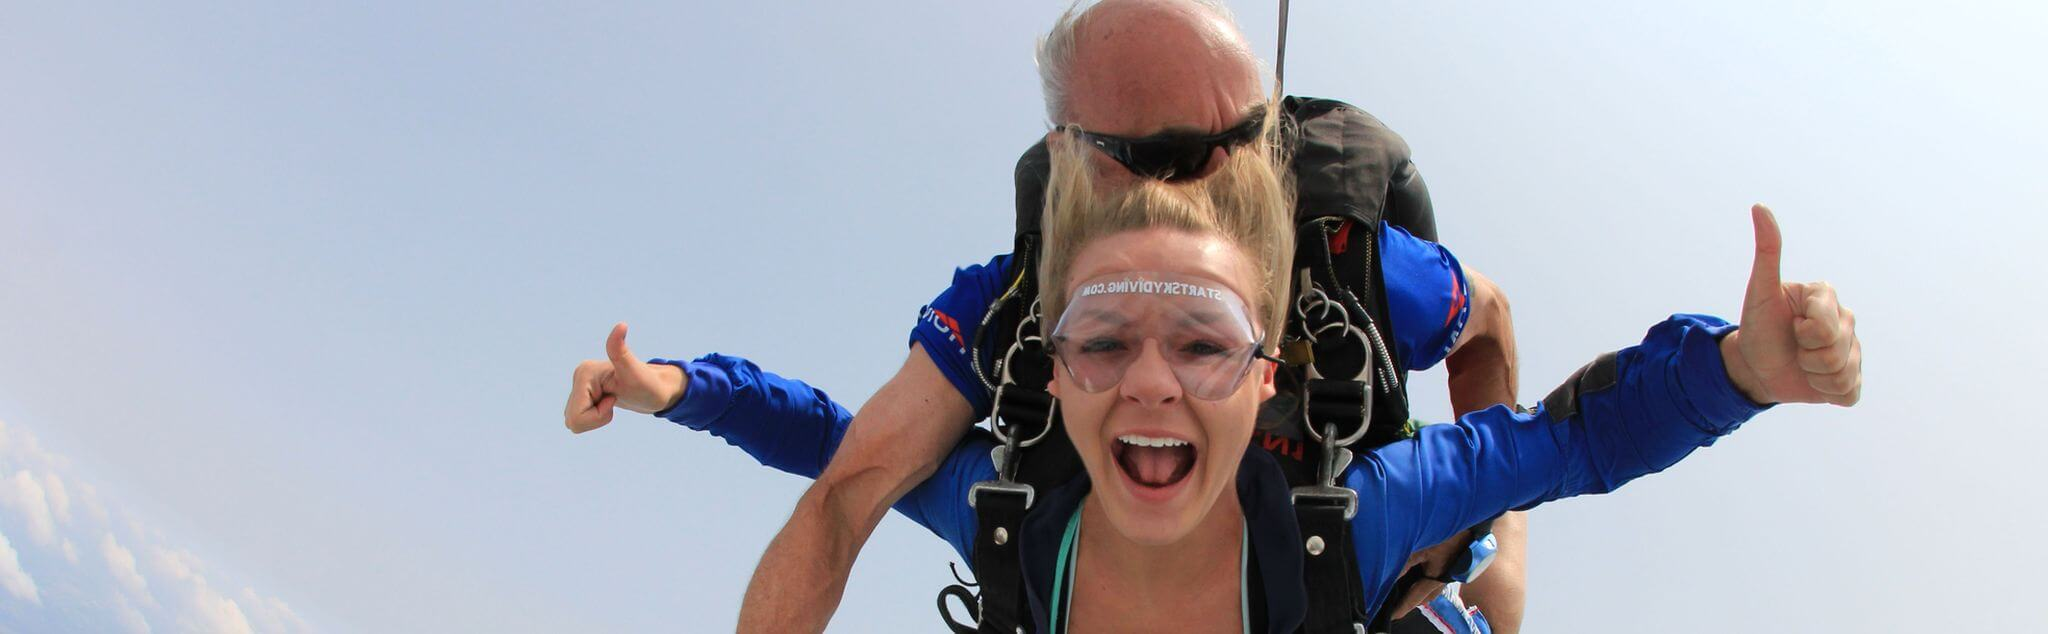 Parachutisme dans Jura